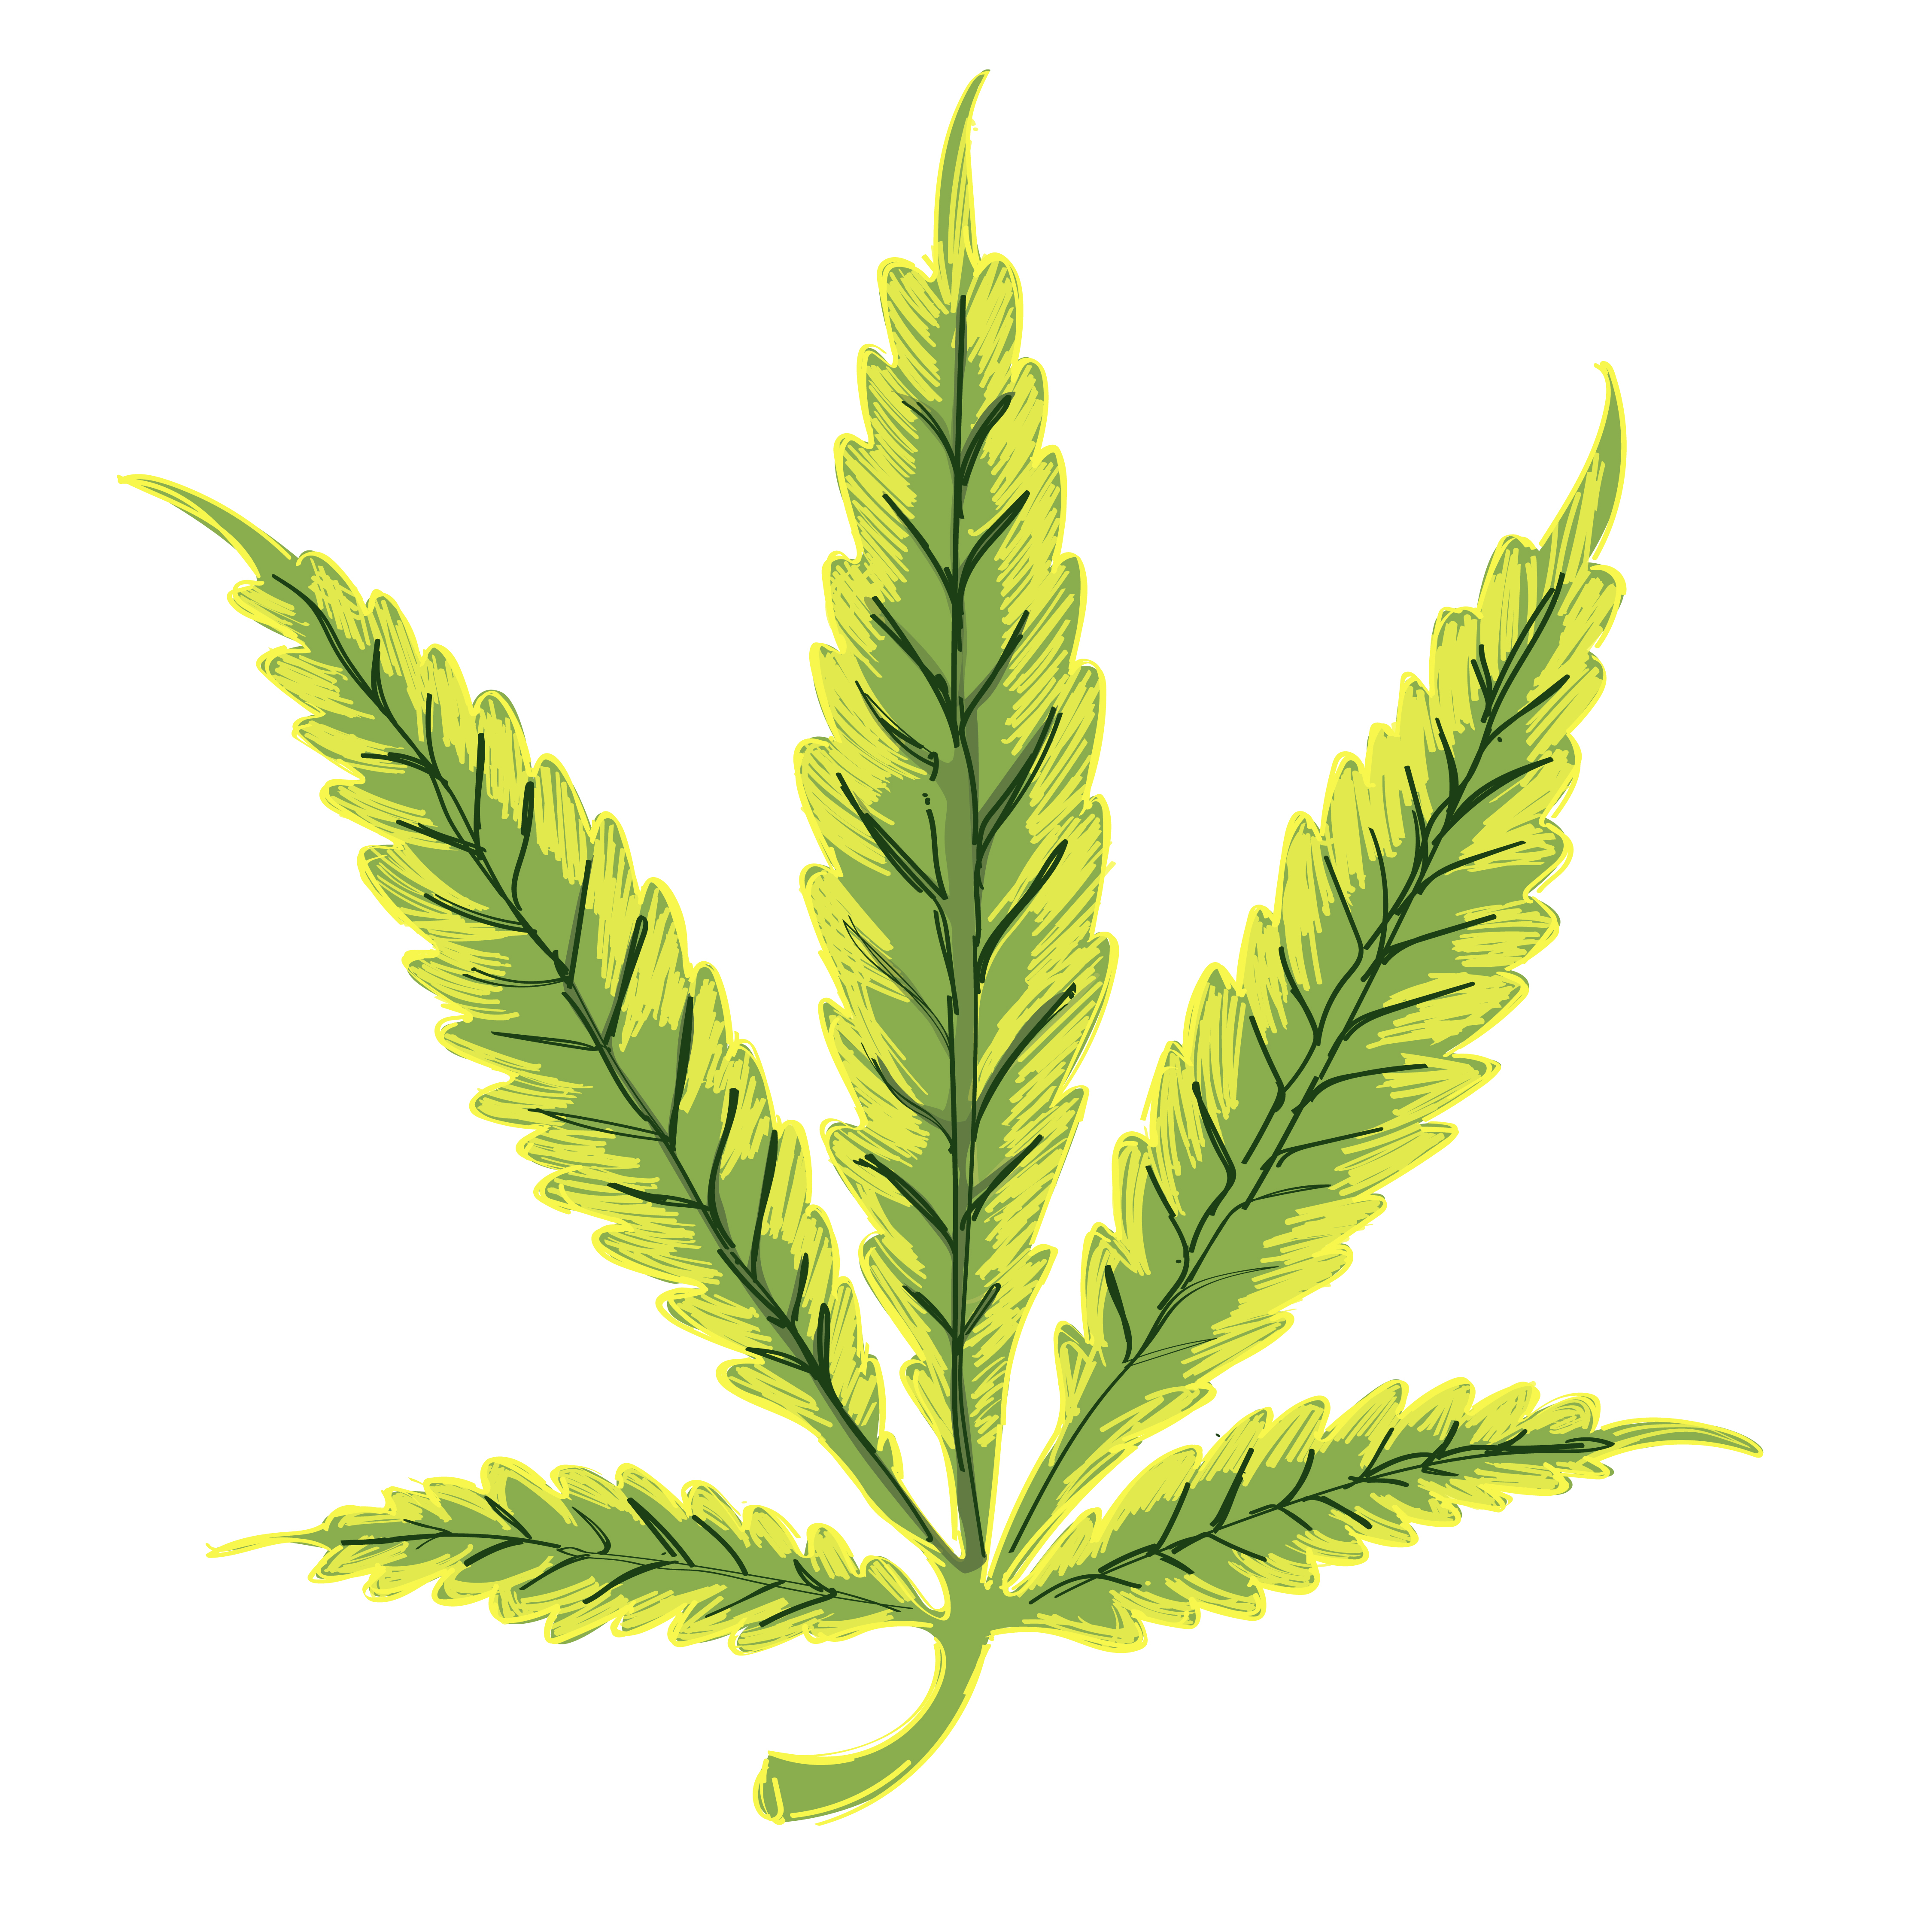 Yellowing leaves is a symptom of a nitrogen deficiency